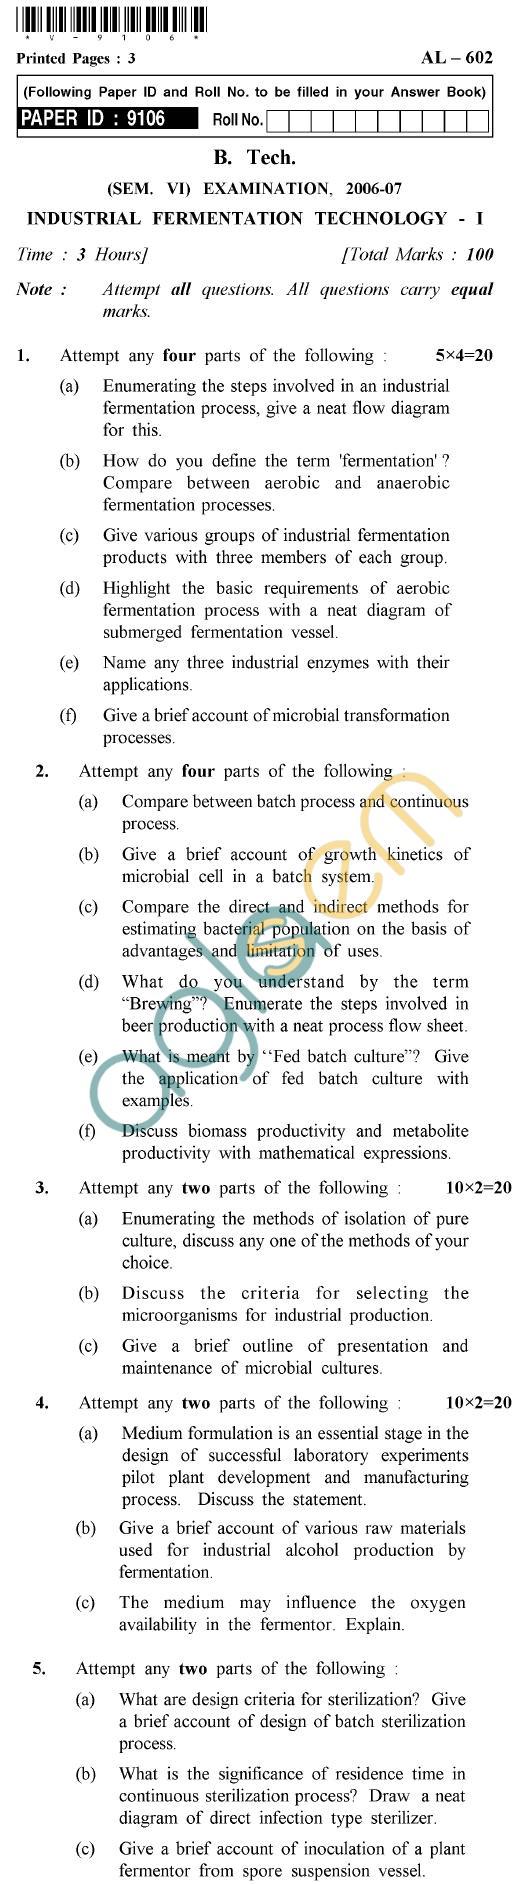 UPTU B.Tech Question Papers -AL-602 - Industrial Fermentation Technology-I